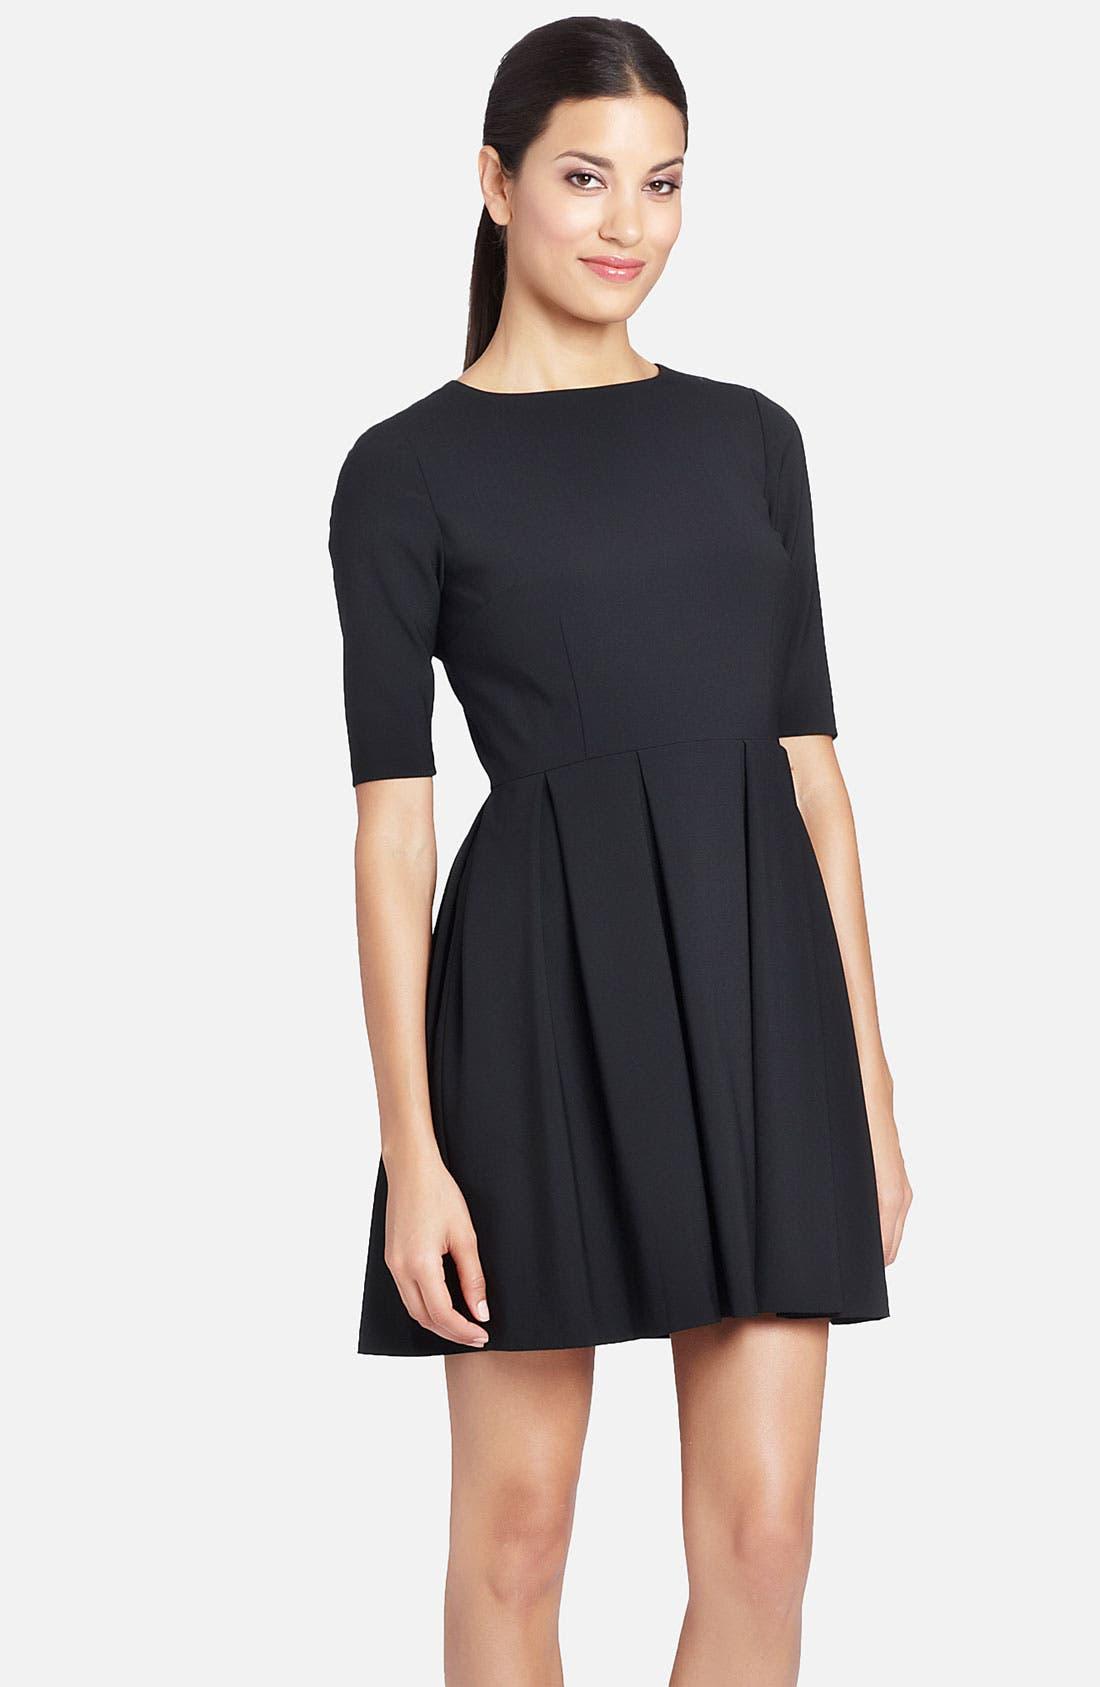 Alternate Image 1 Selected - Cynthia Steffe 'Marietta' Pleated Skirt Fit & Flare Dress